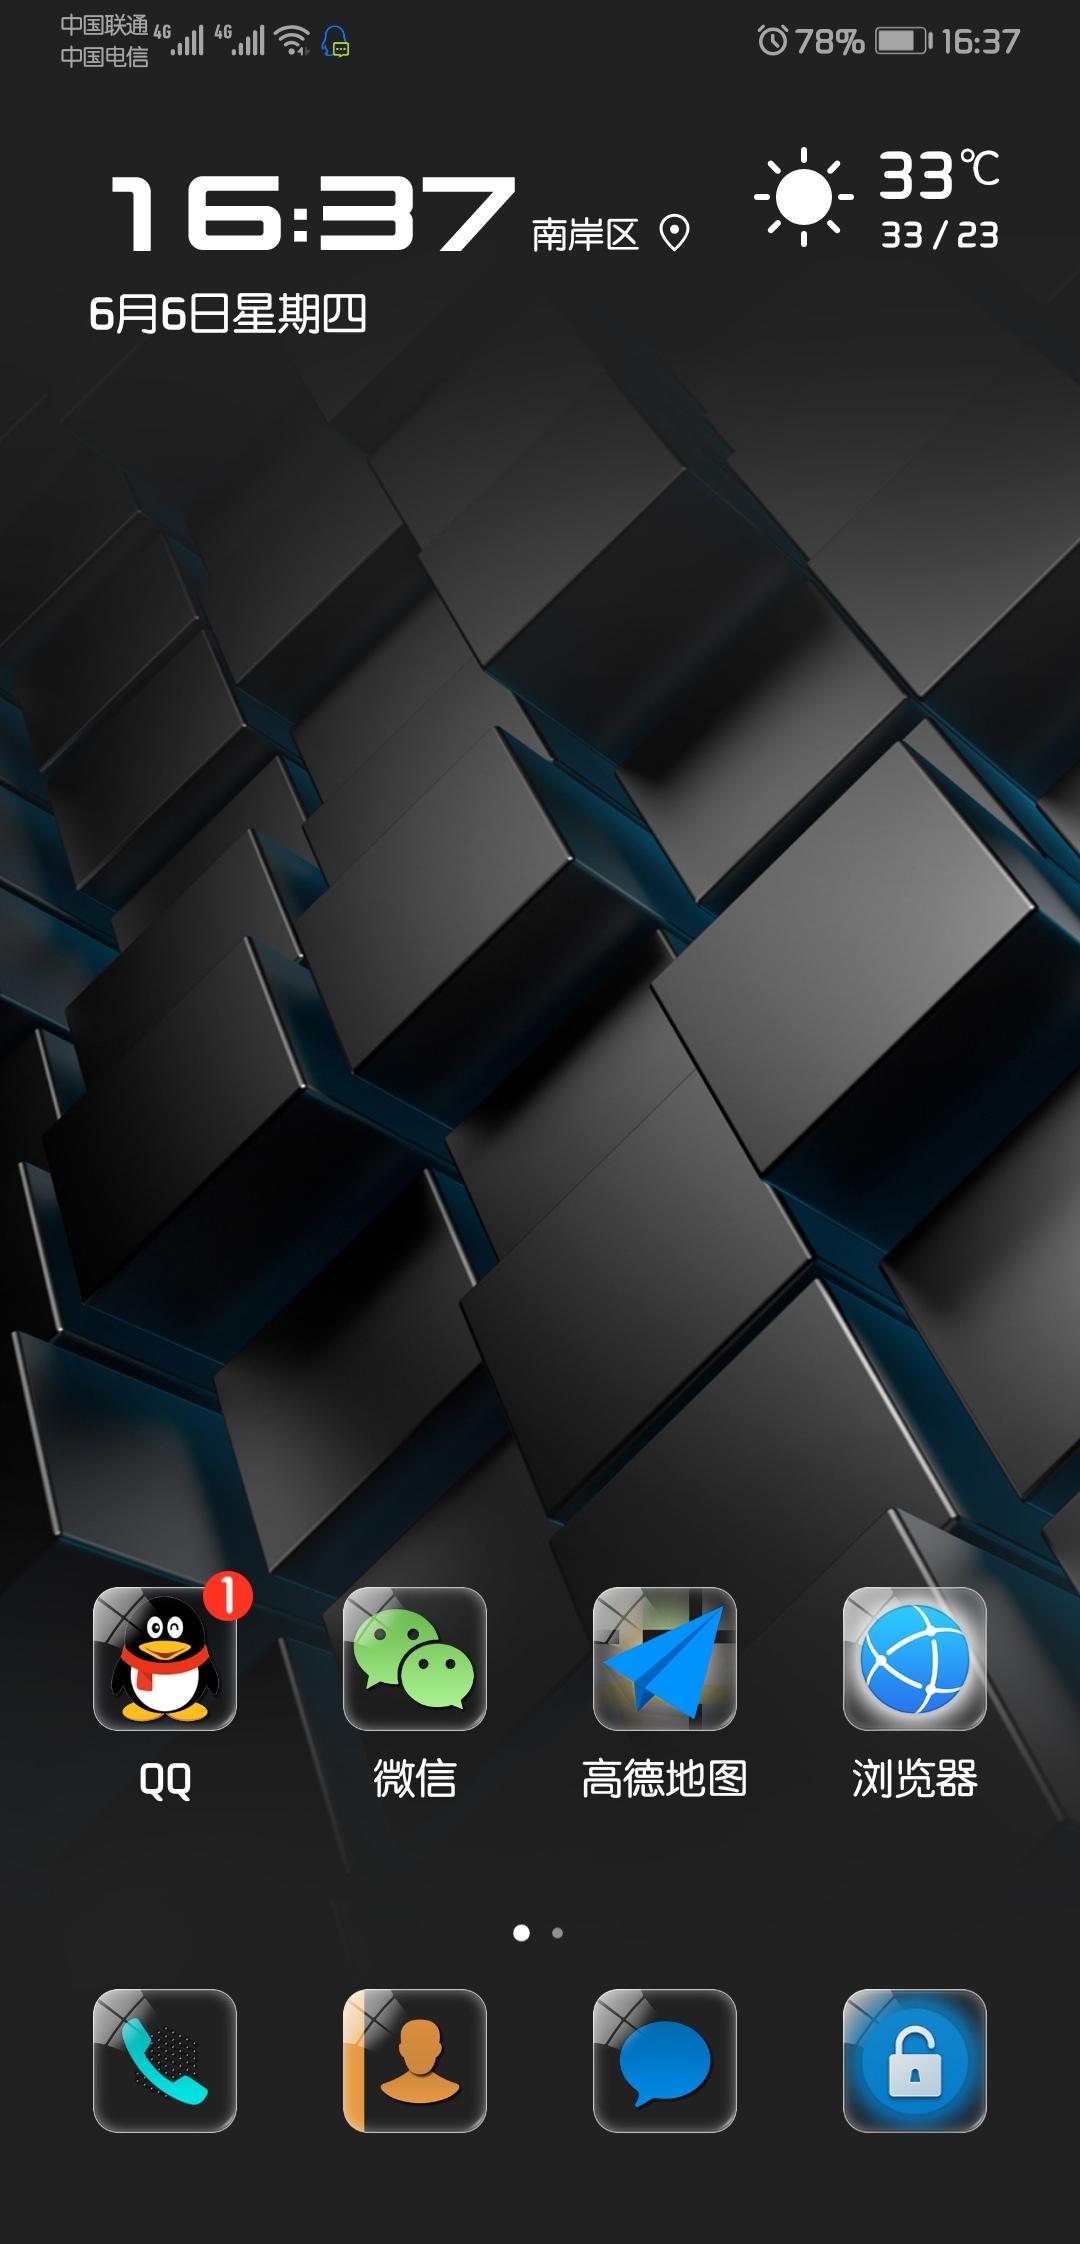 Screenshot_20190606_163720_com.huawei.android.lau.jpg